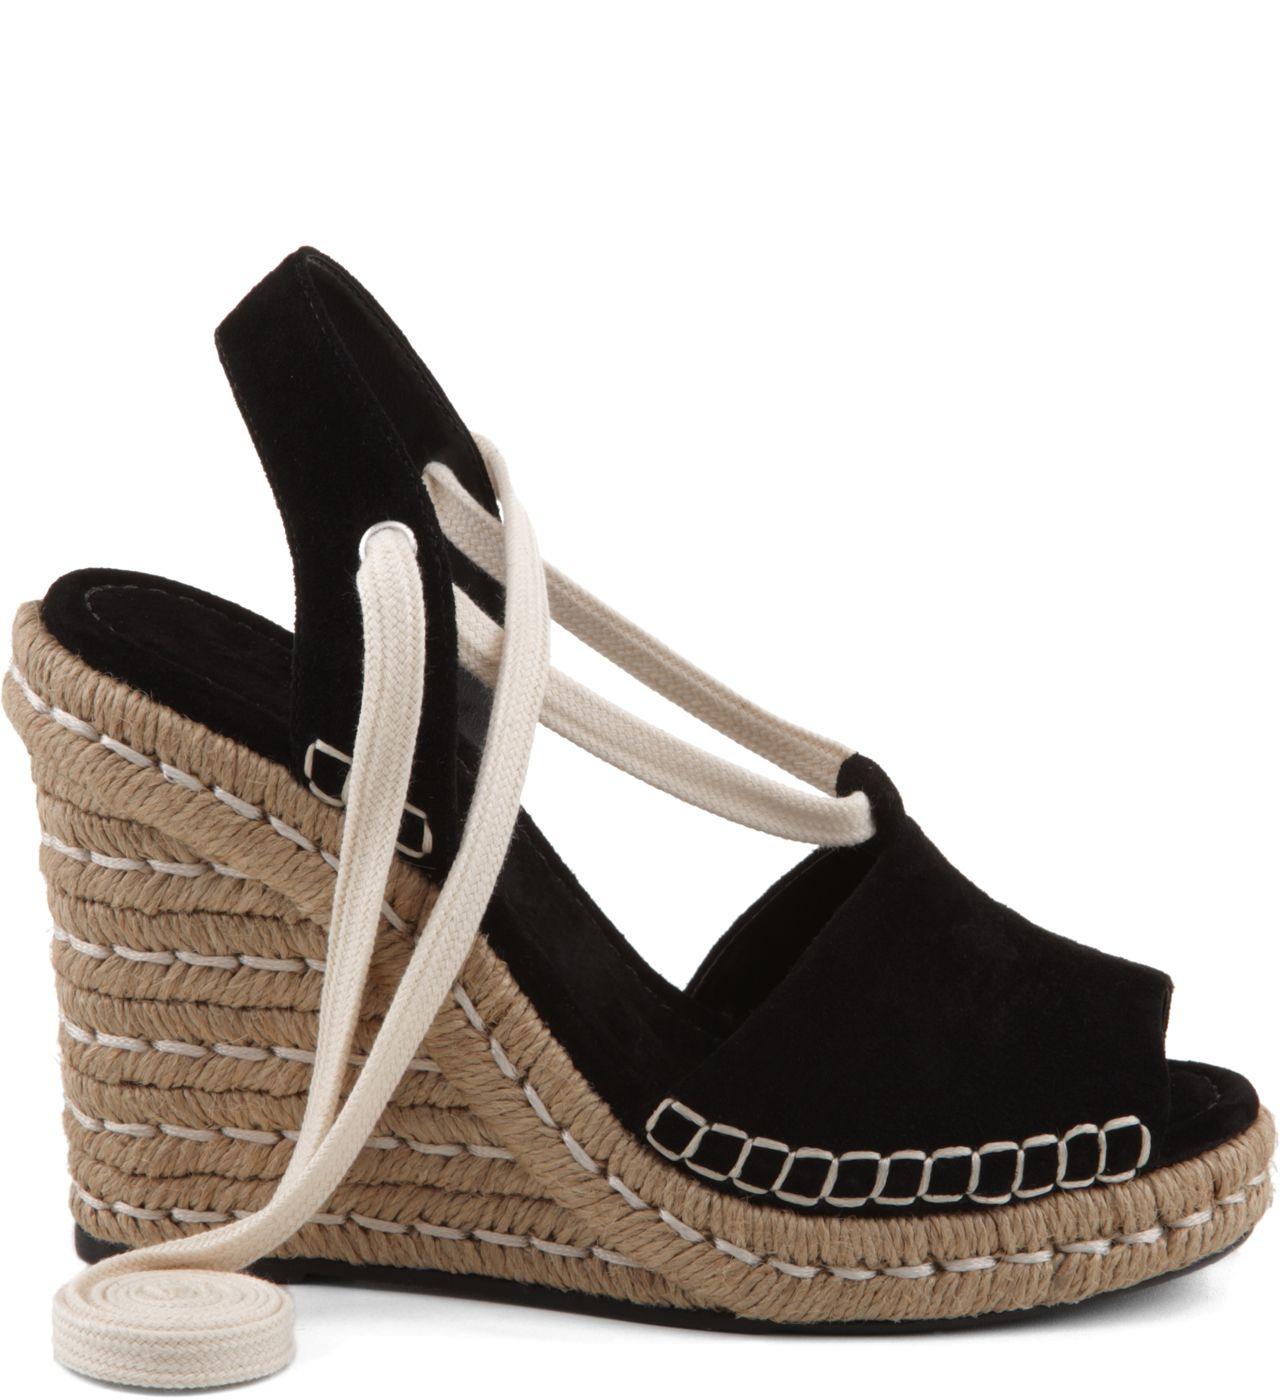 eb686f34e ESPADRILLE ANABELA JUTA BLACK | Schutz shoes | Espadrilles, Shoes e ...